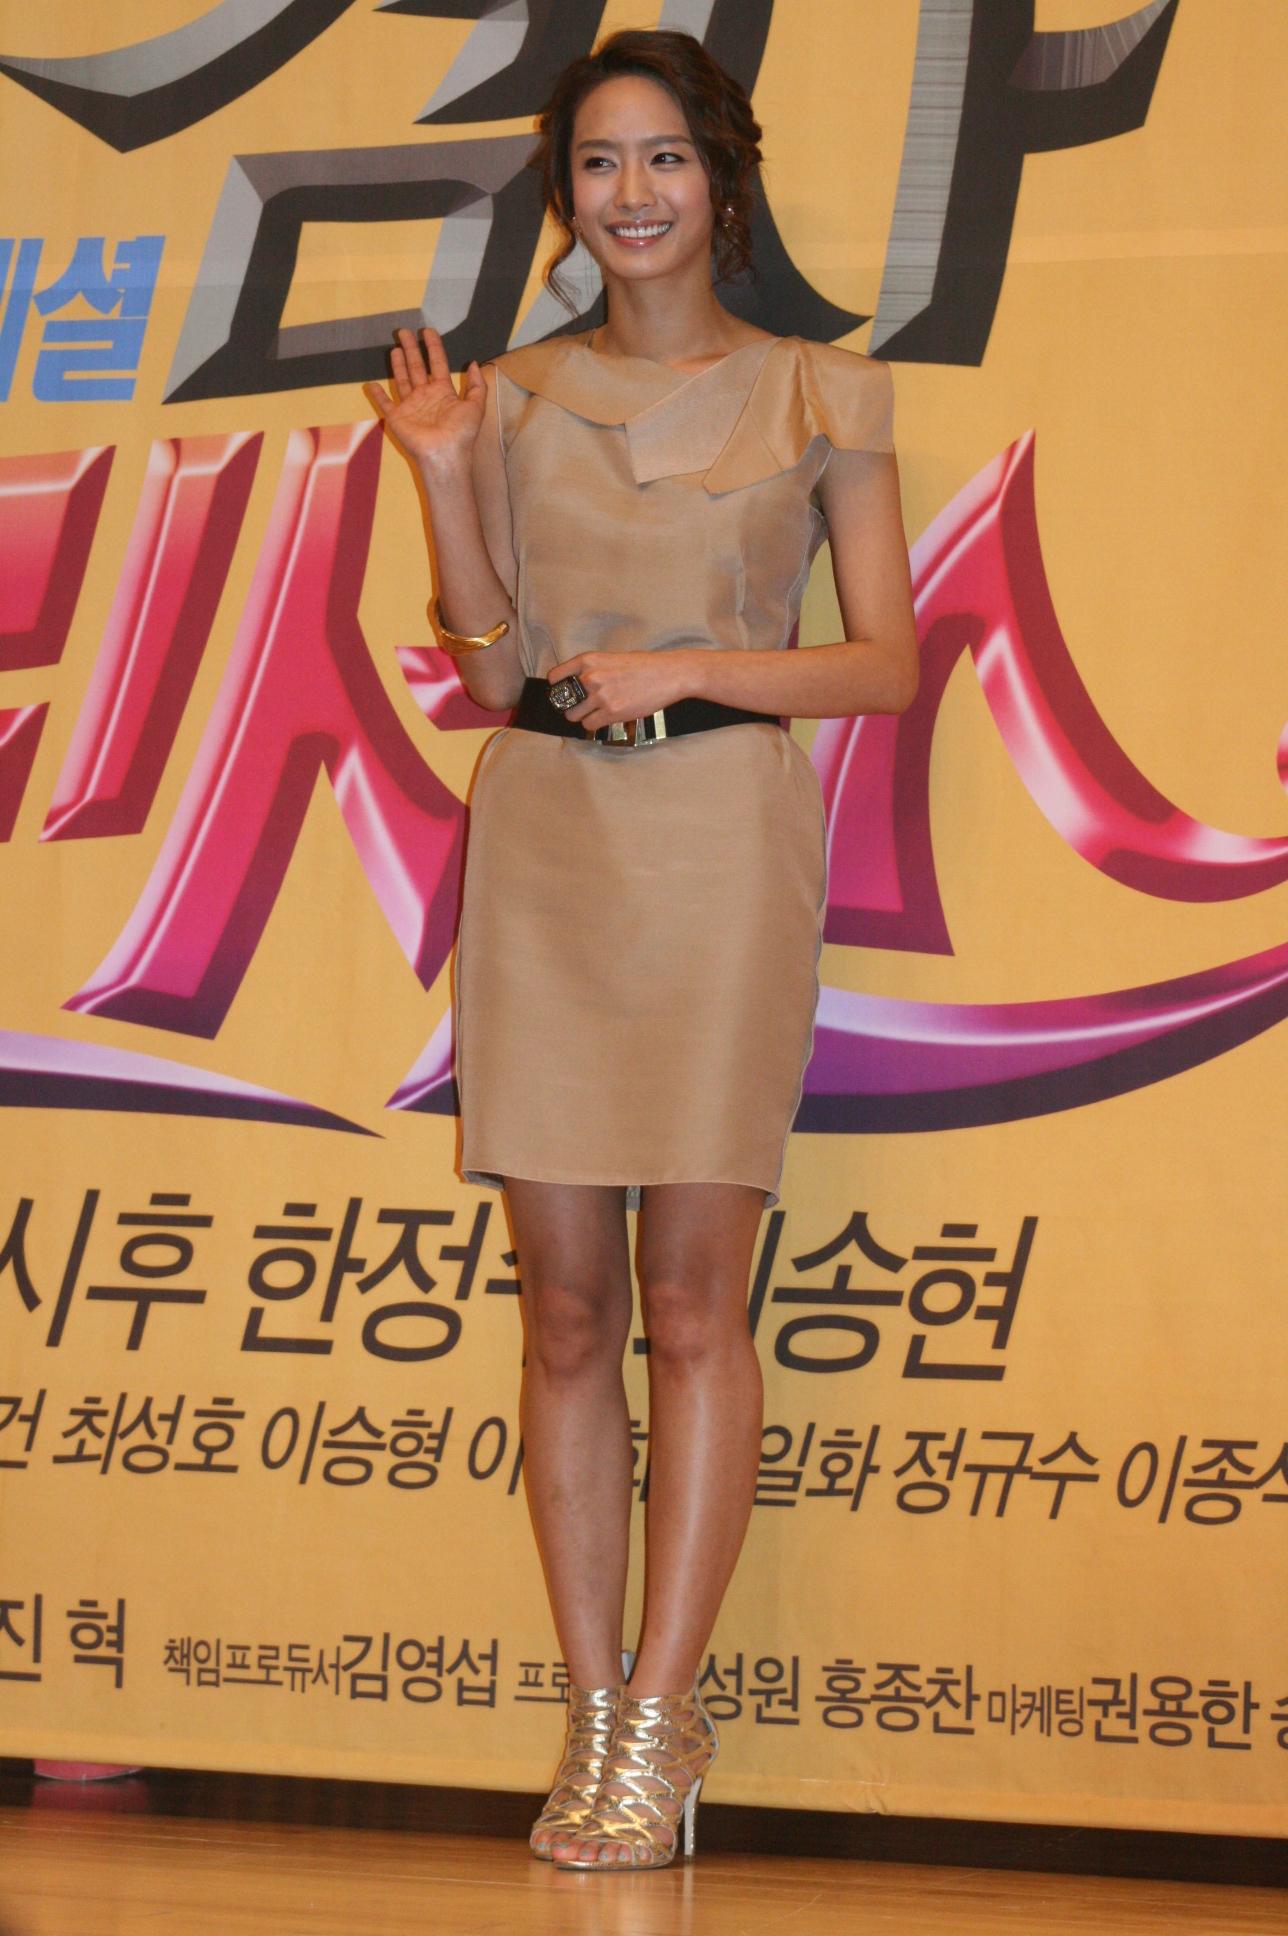 Gil park jung ah dating